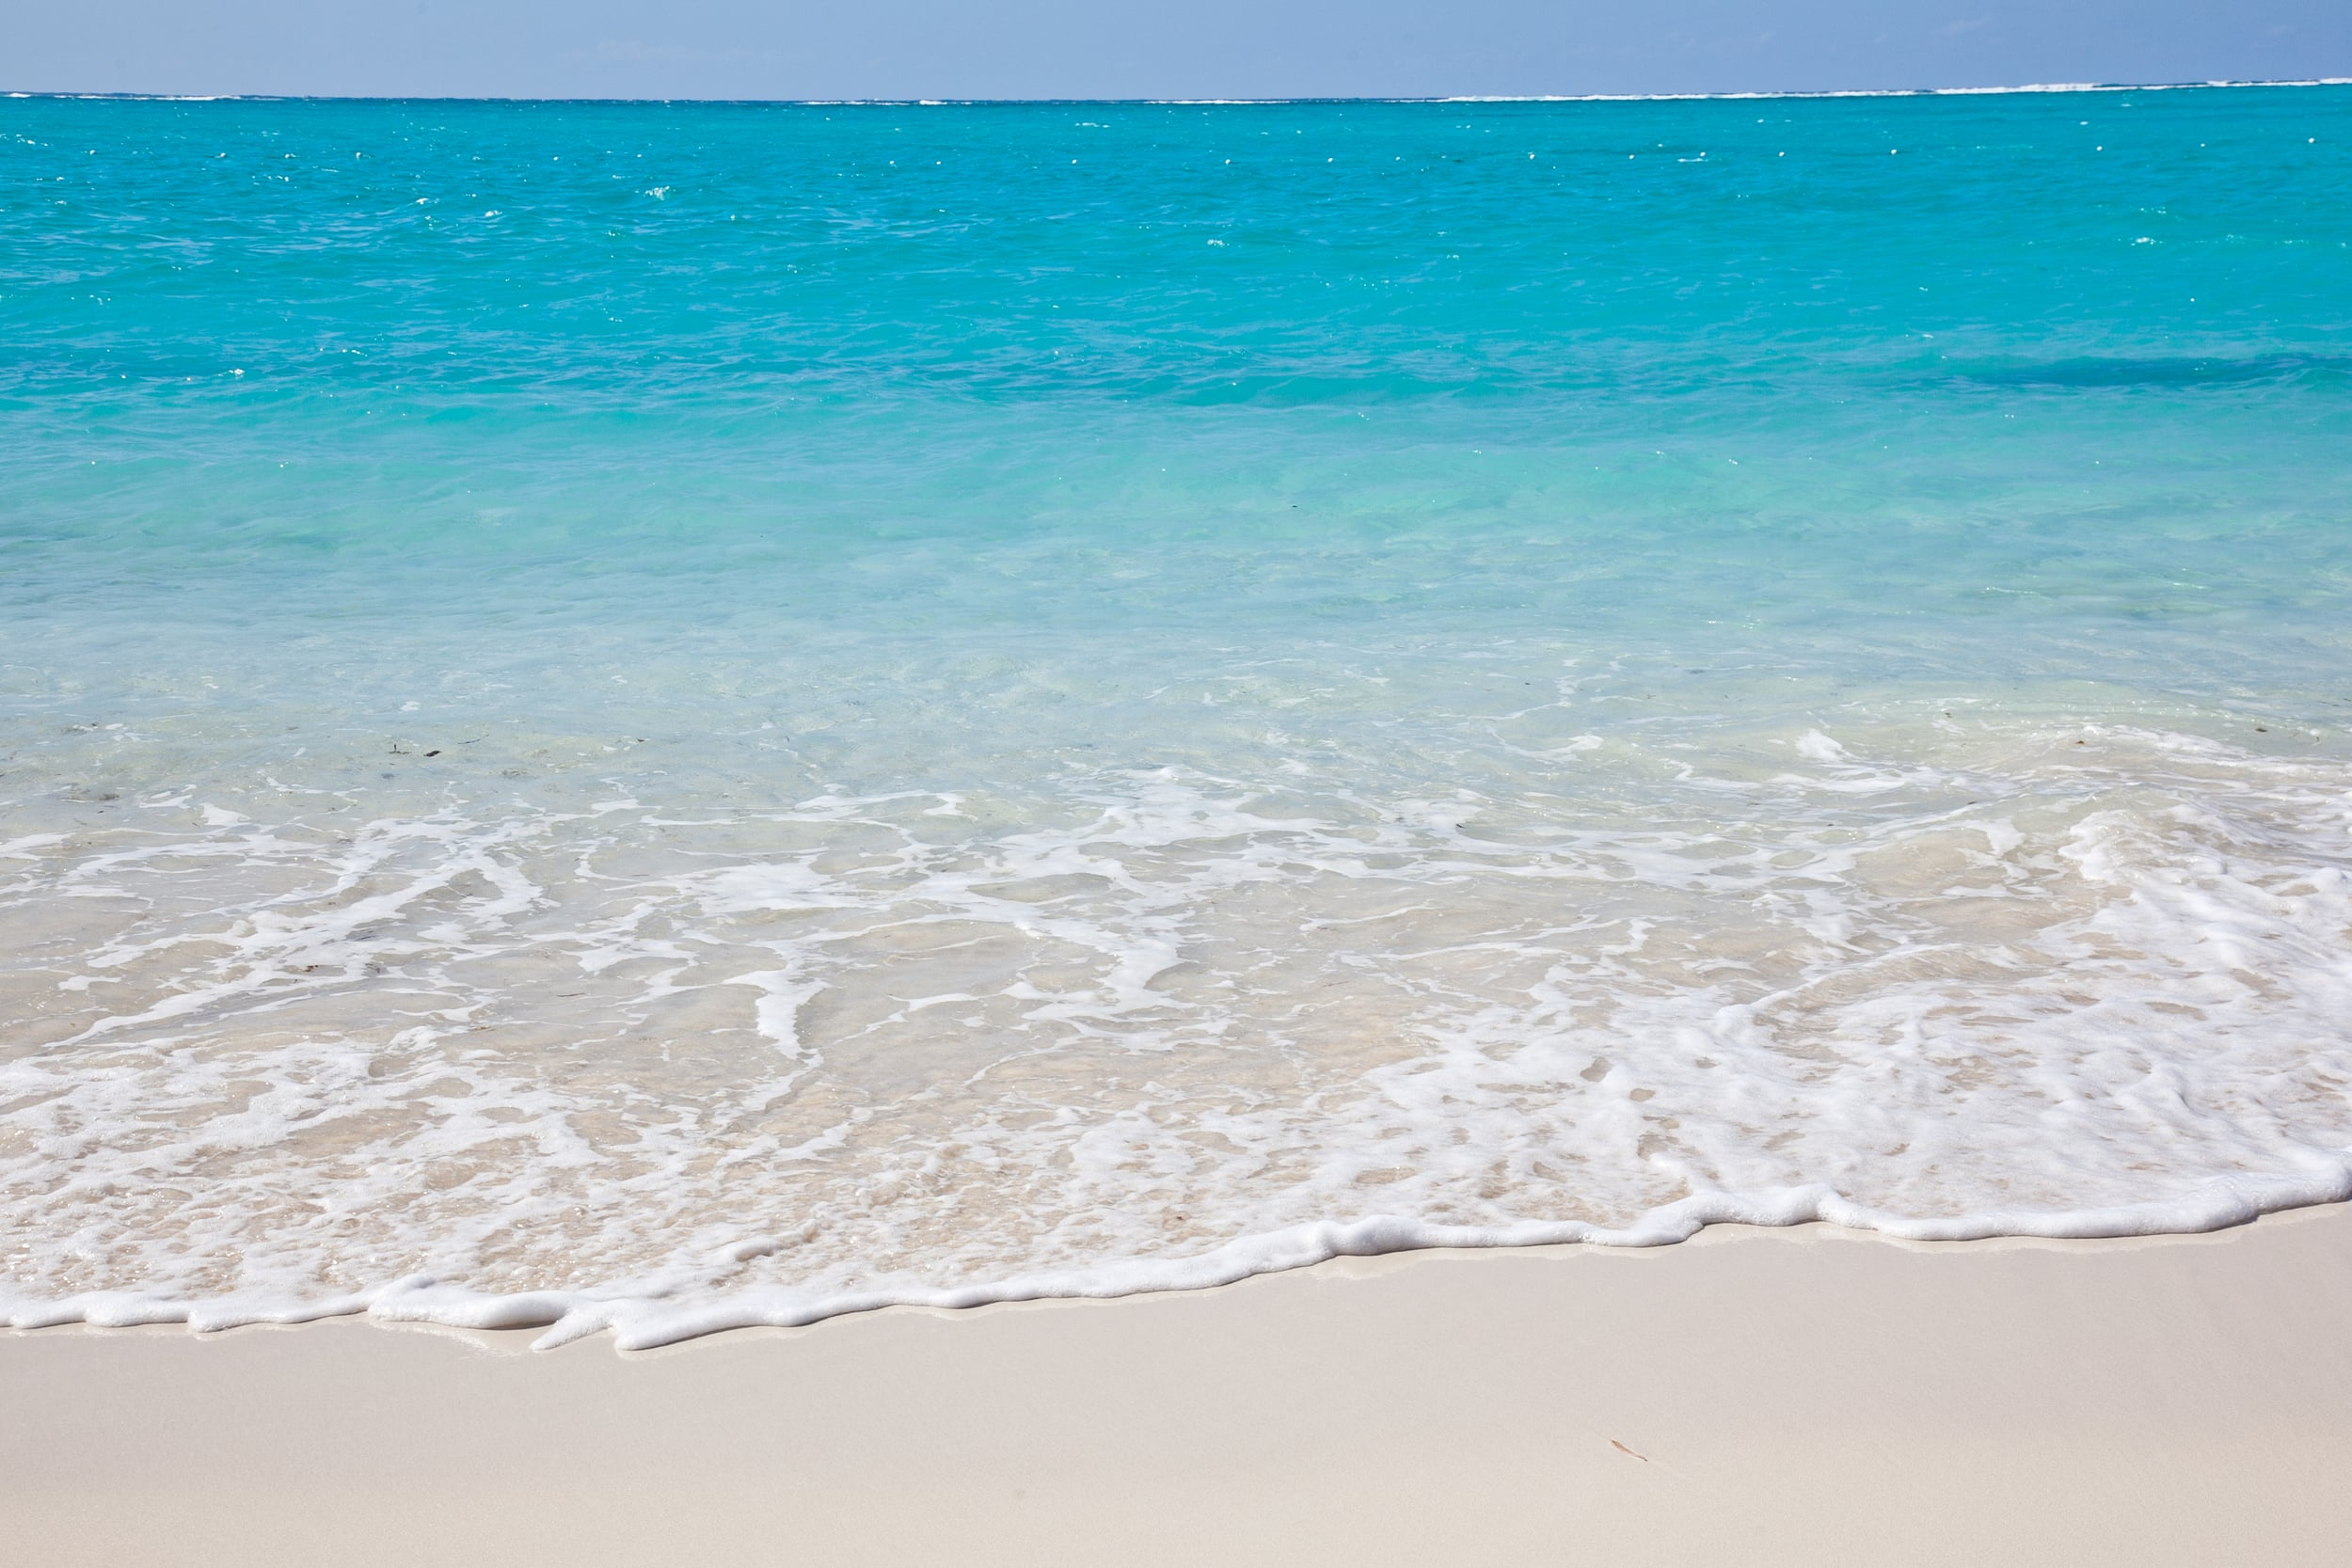 trisa-taro-beach-ocean-turks and caicos.jpg